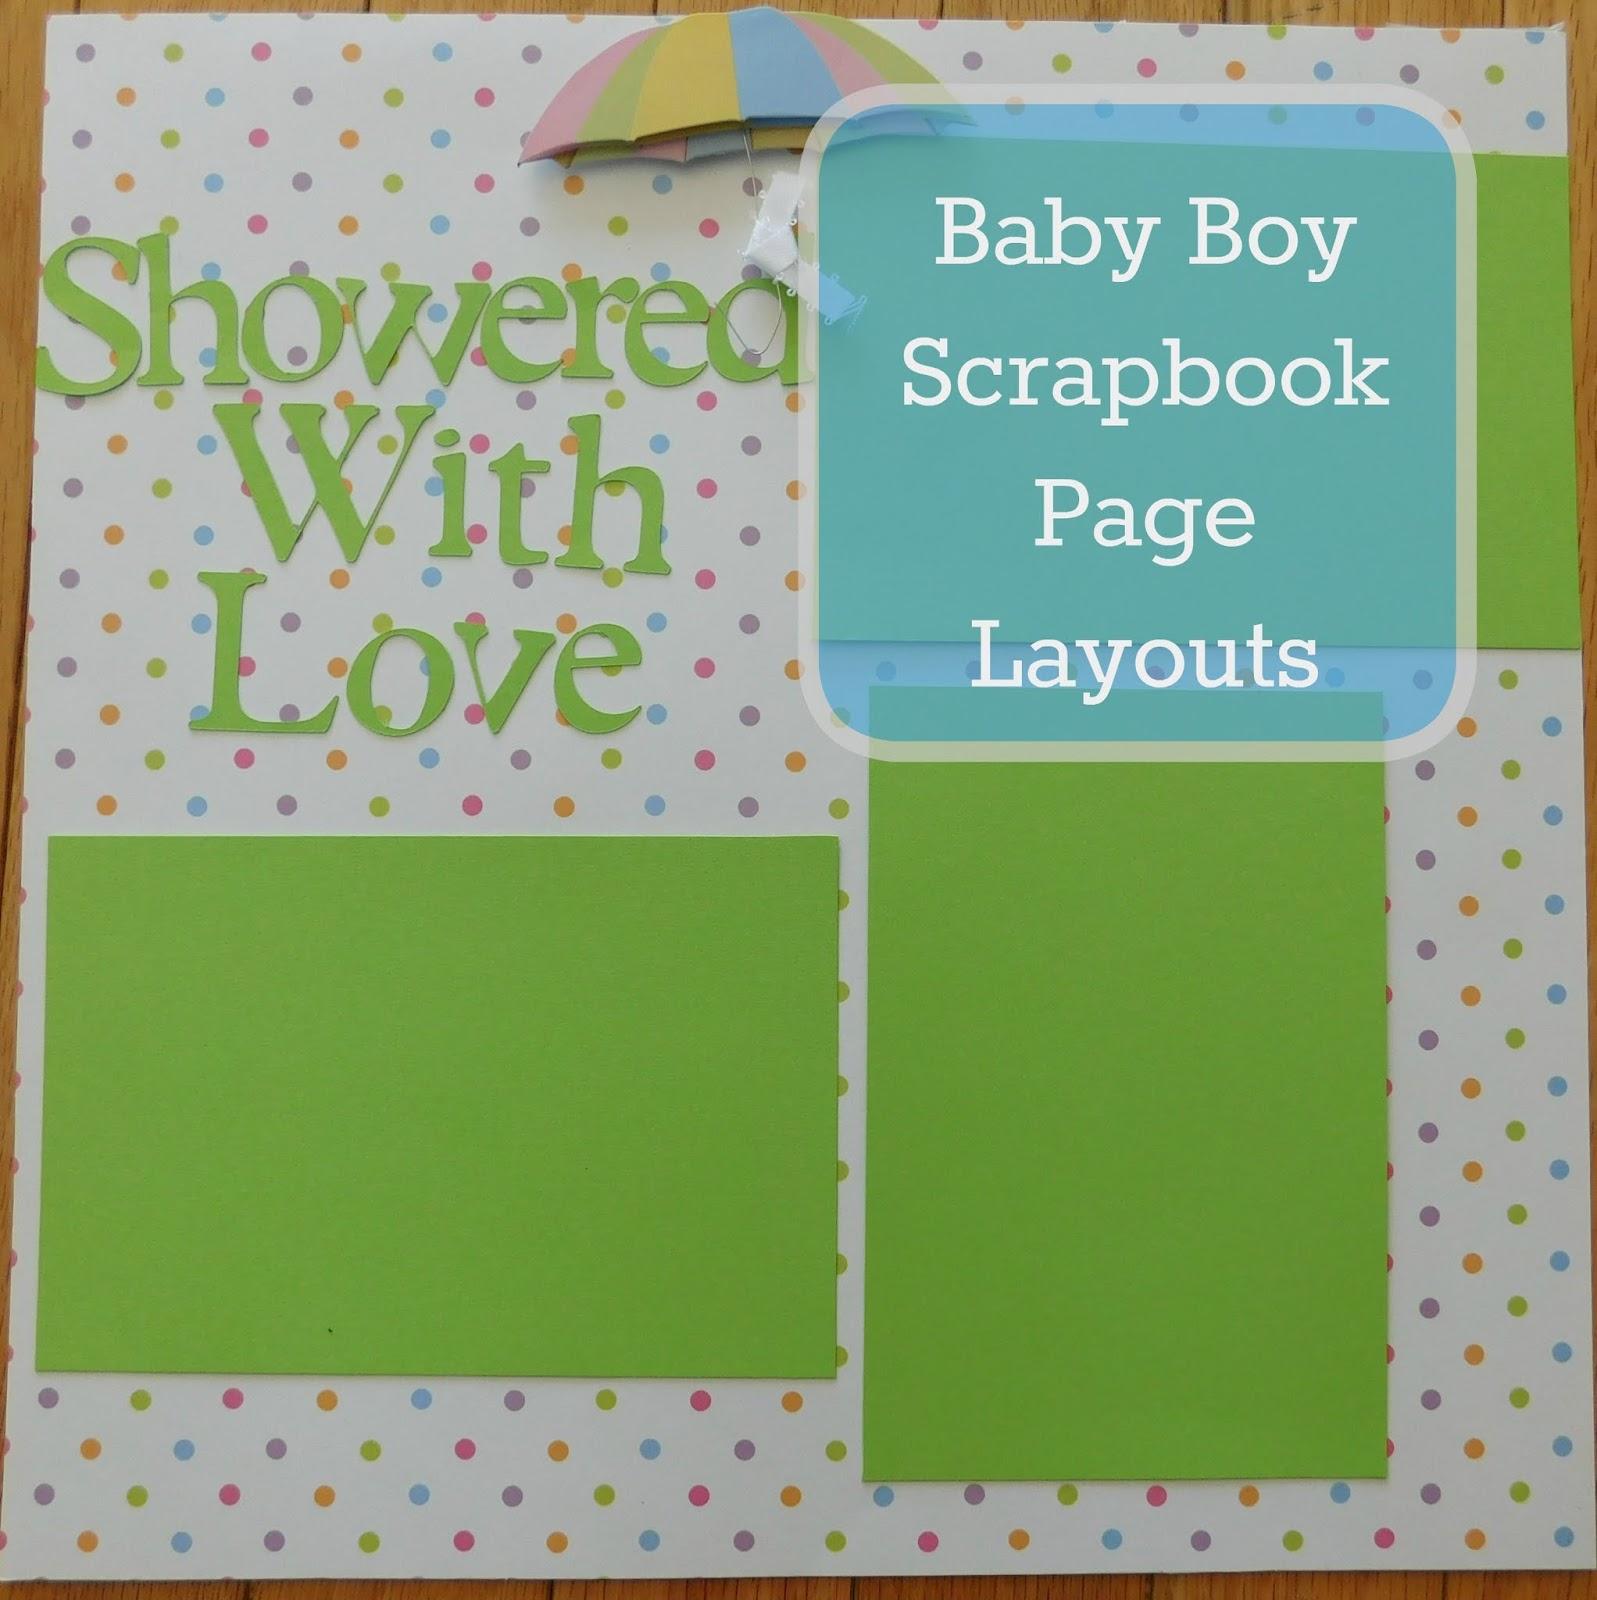 Scrapbook ideas for elderly - Baby Boy Scrapbooking Page Layouts